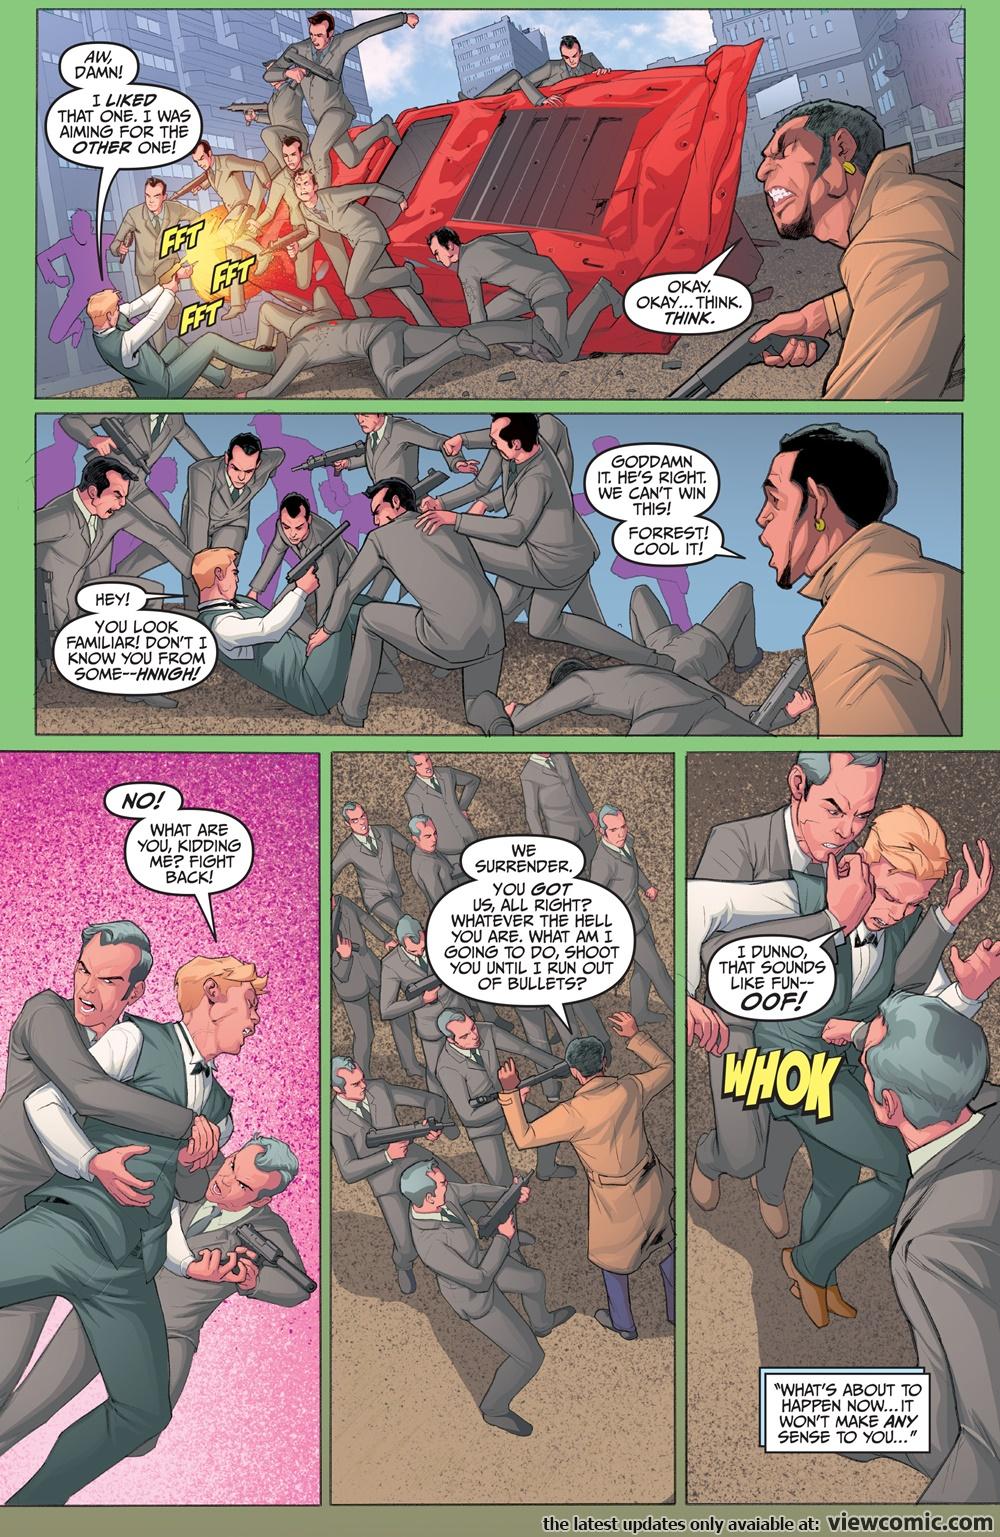 Jackpot 005 (2017) . | Vietcomic.net reading comics online for free